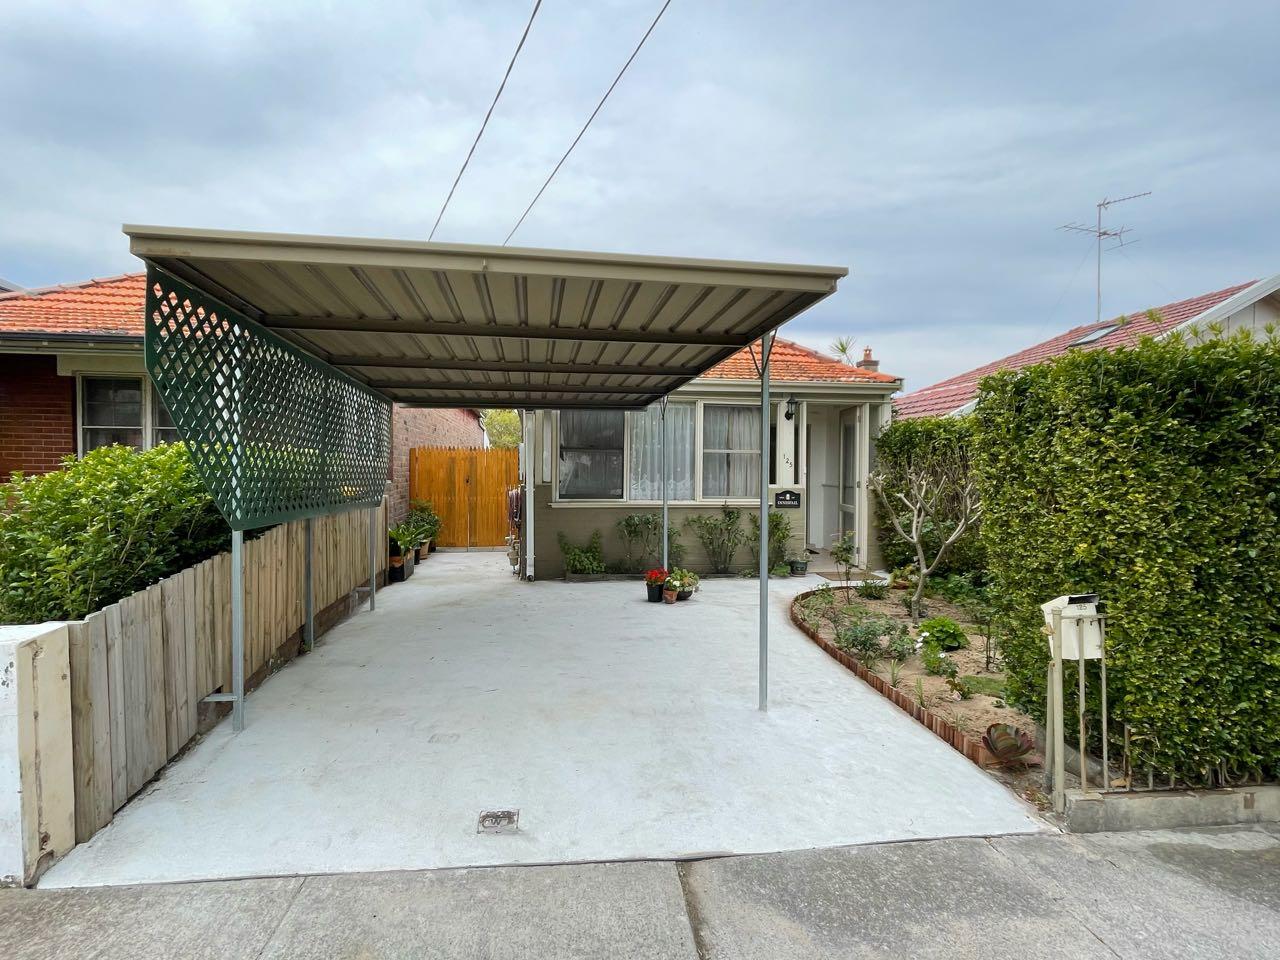 125 Bunnerong Rd, Kingsford NSW 2032, Australia